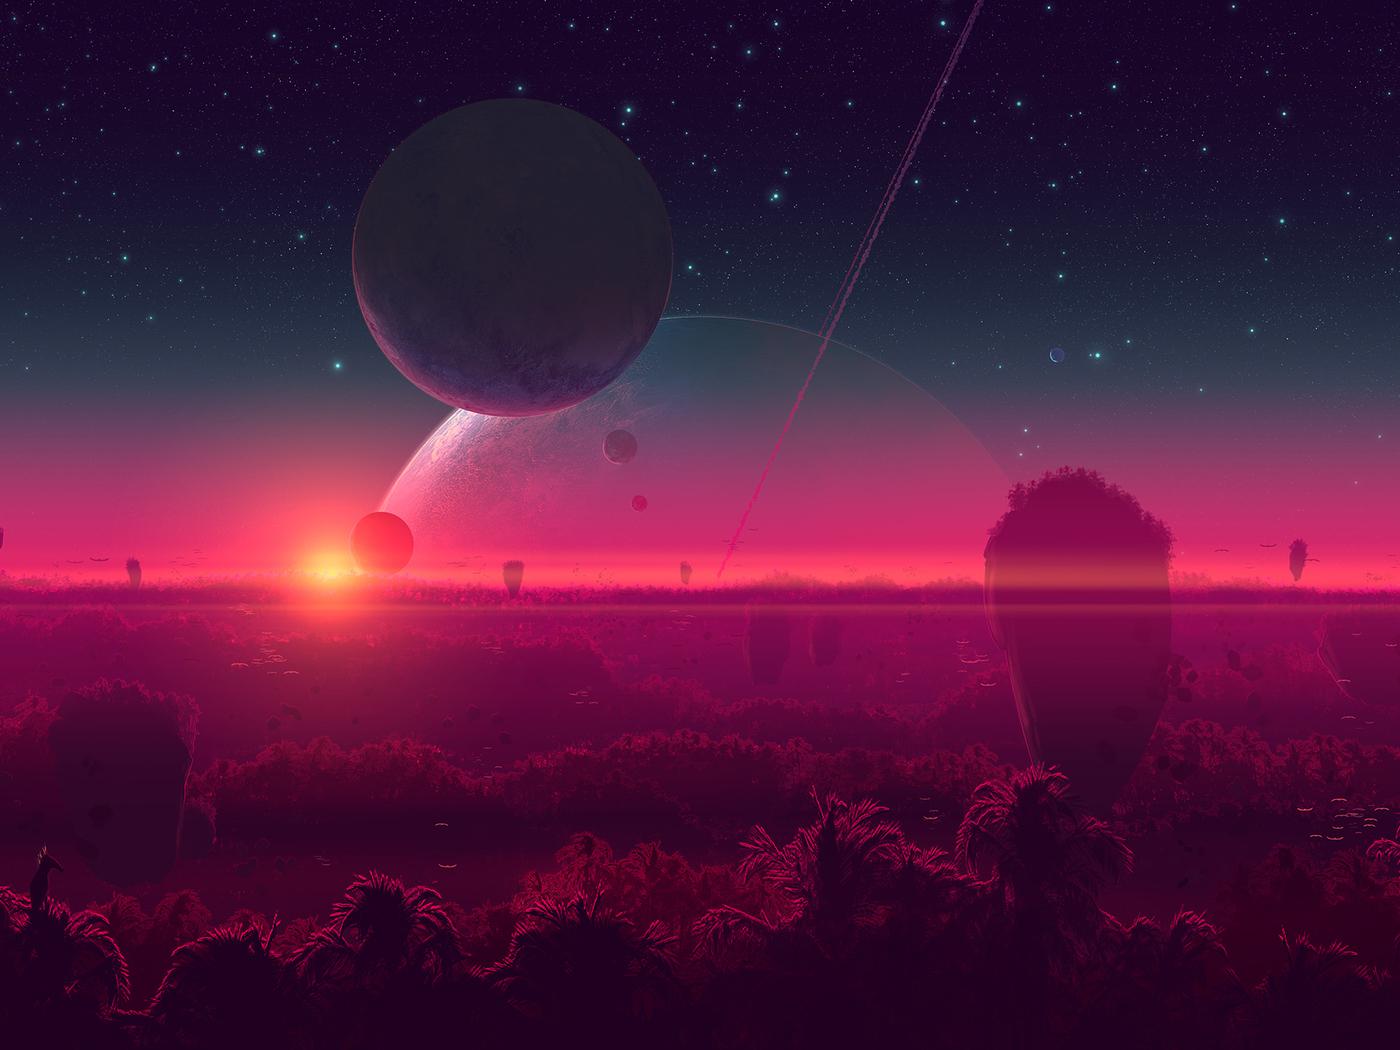 planet-space-art-ka.jpg